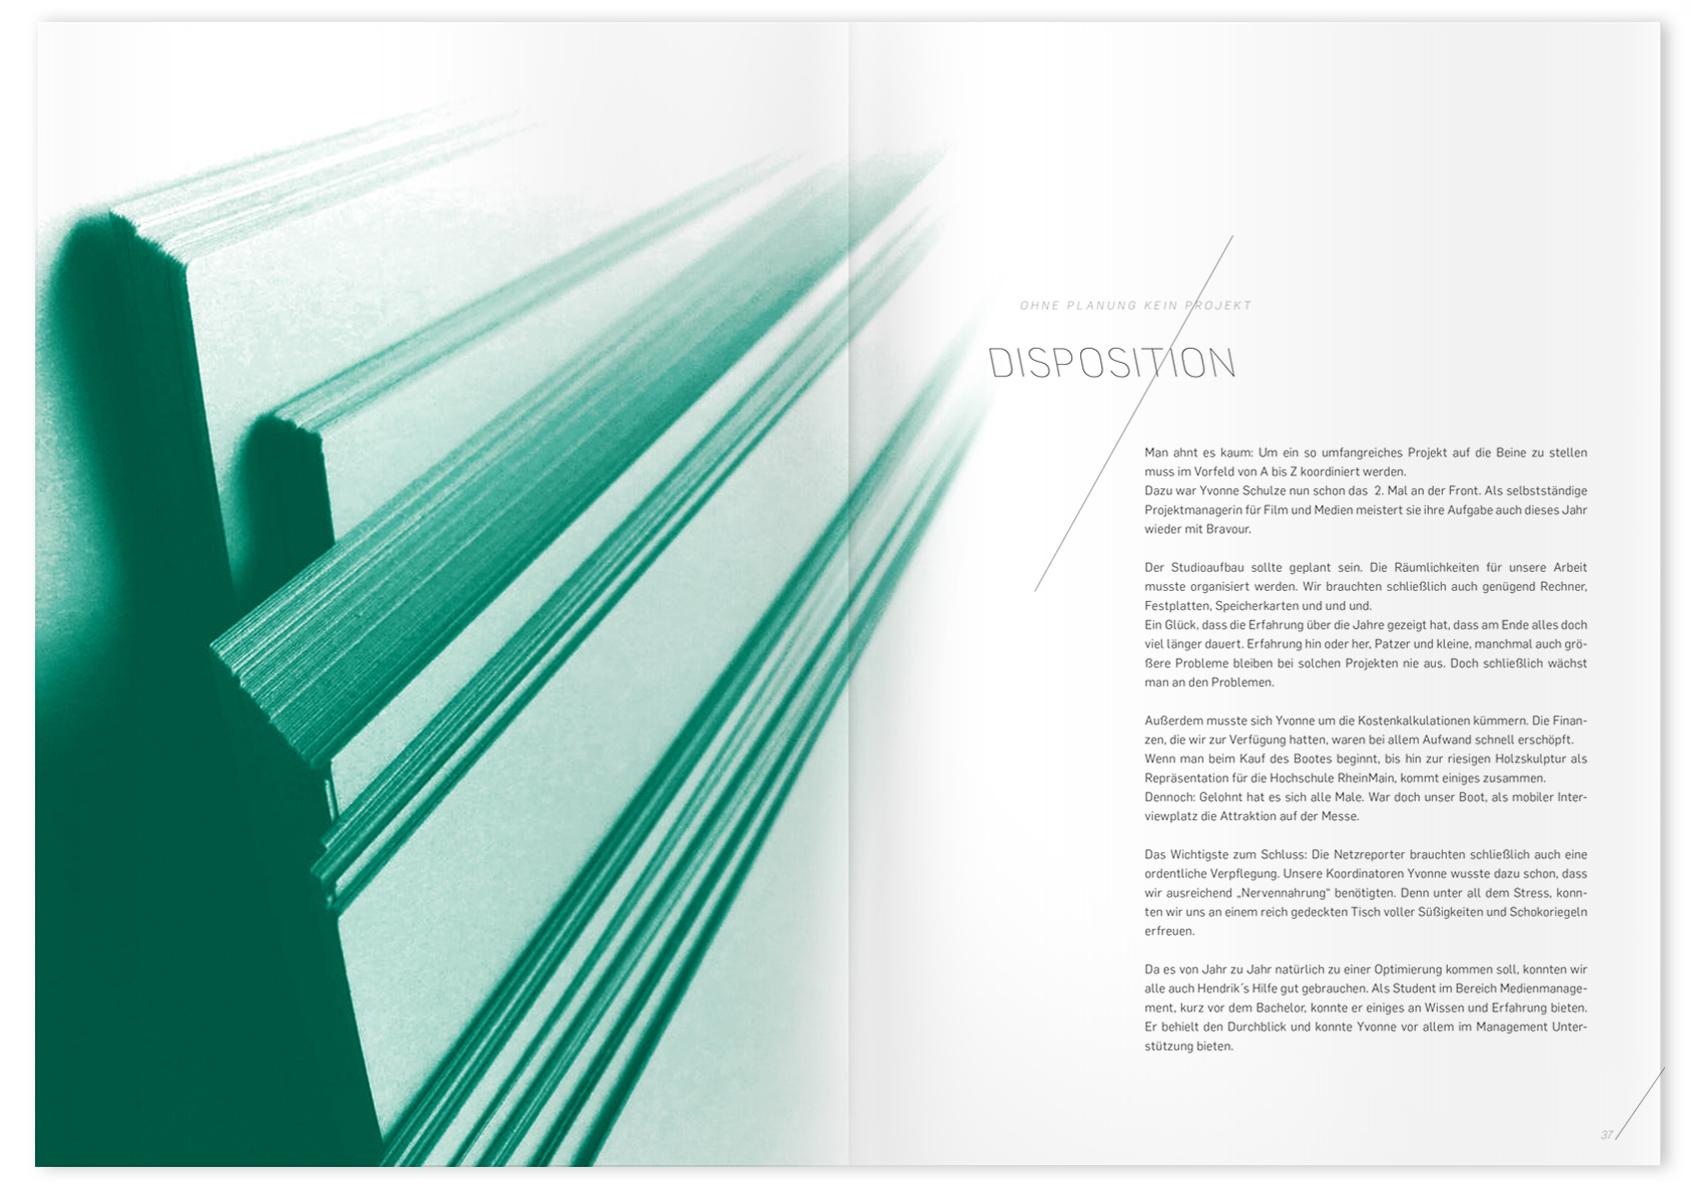 07_hFMA Netzreporter_ADC Festival_Editorial Design_Grafikdesign_Gloria Kison.jpg